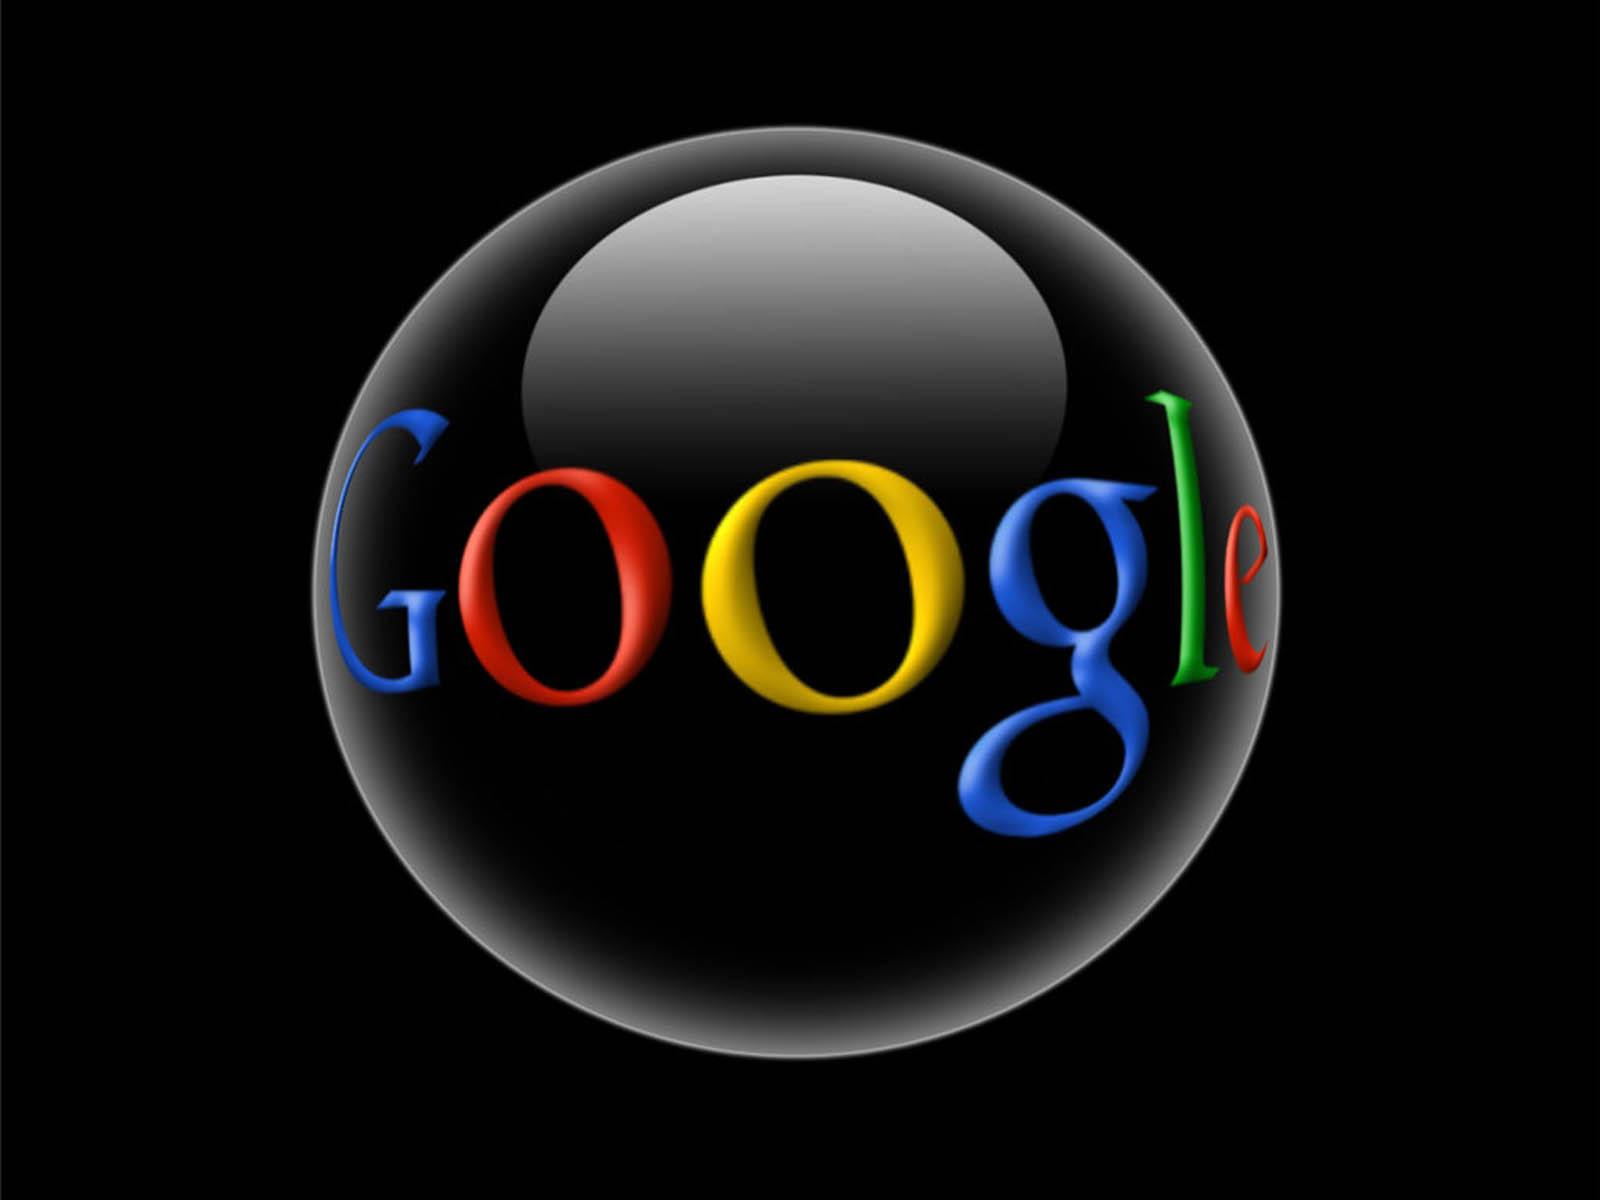 Google Desktop Background - WallpaperSafari